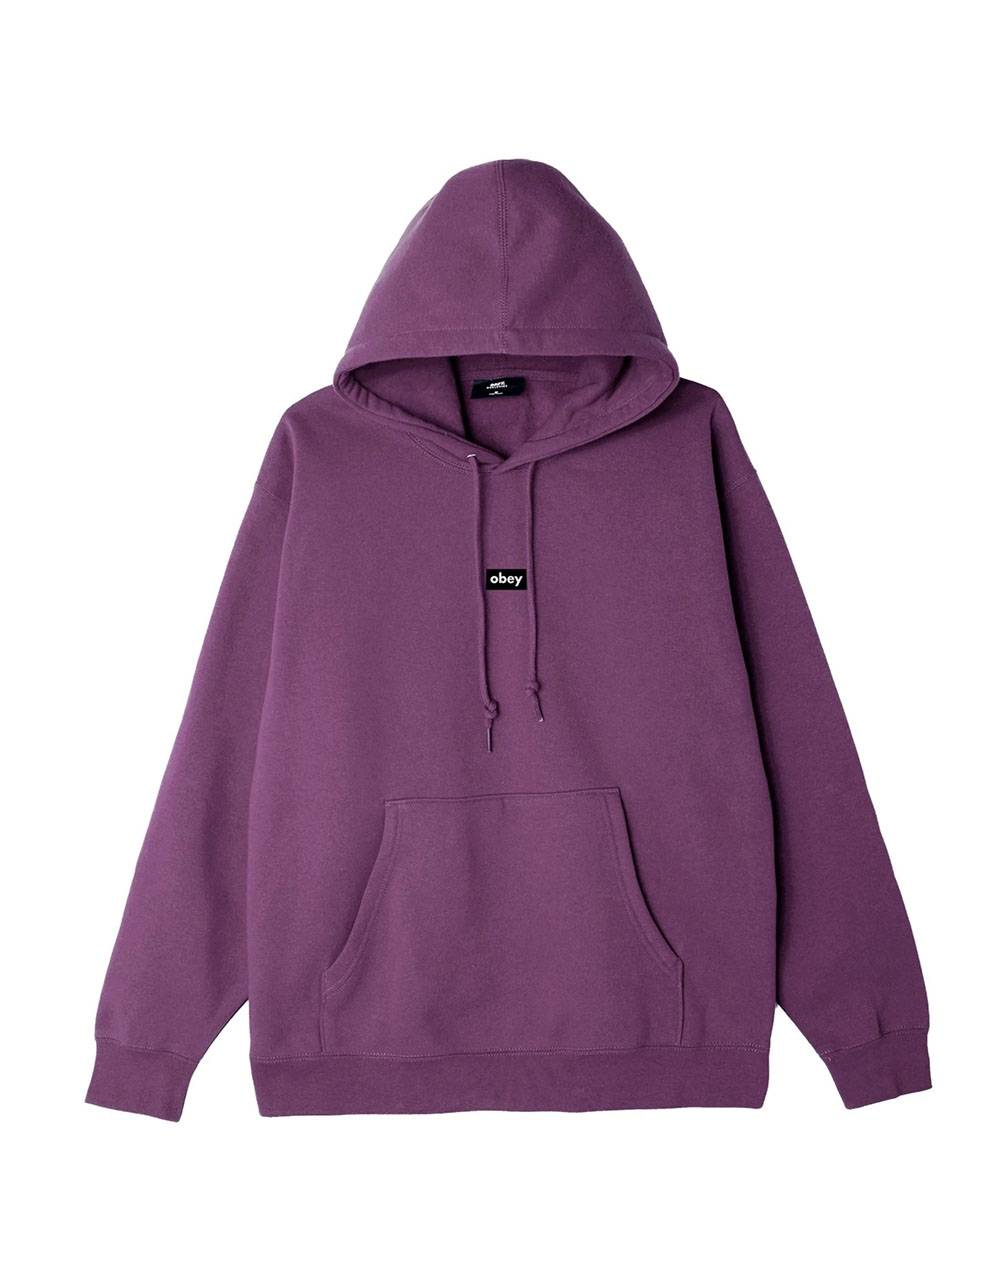 Obey Black bar premium hoodie - purple nitro obey Sweater 89,34€